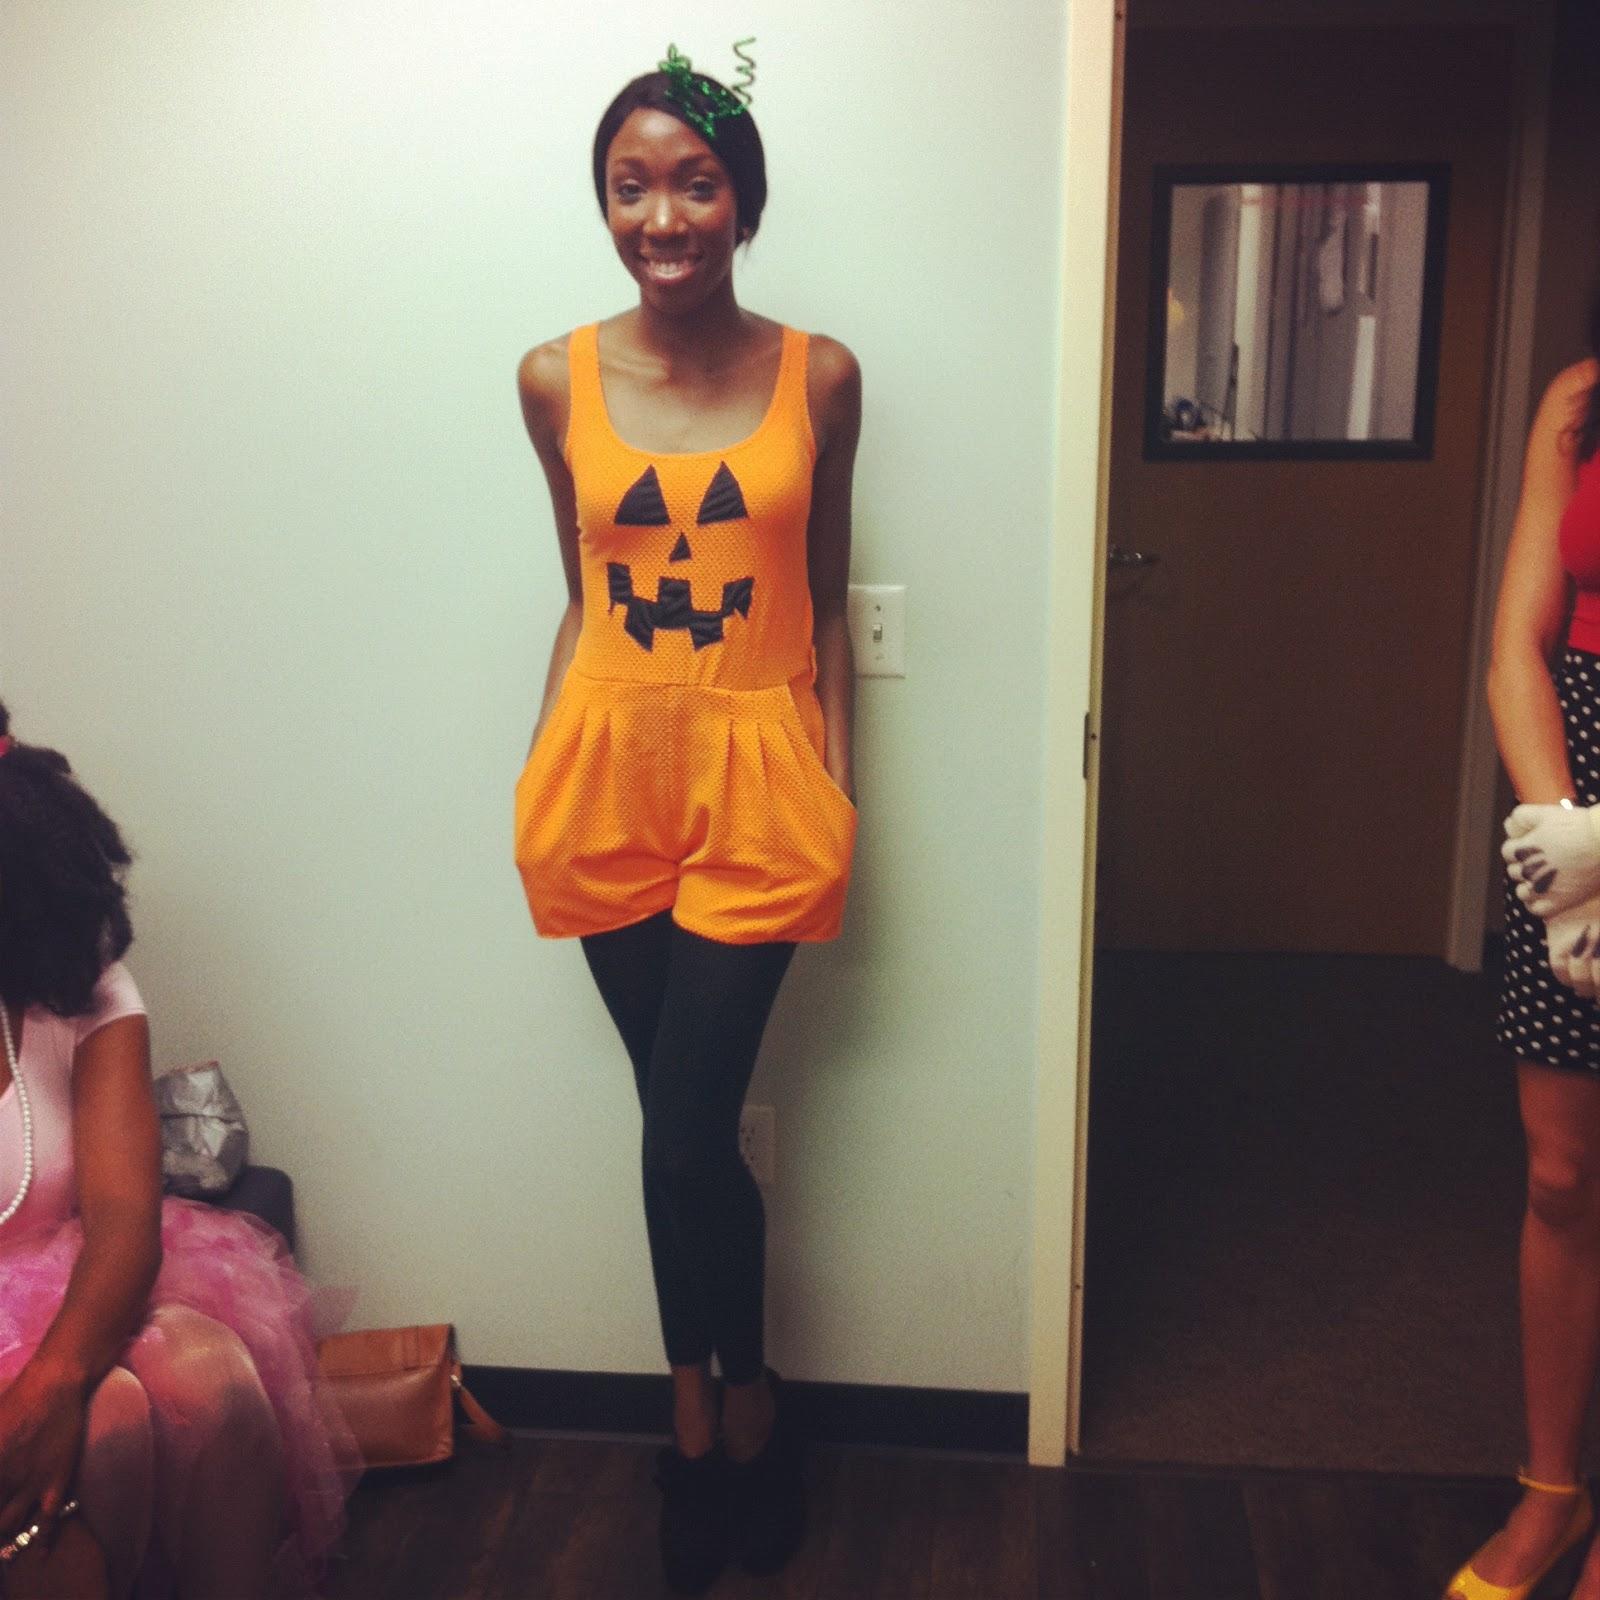 5 diy halloween costume ideas under 5$ | roserags